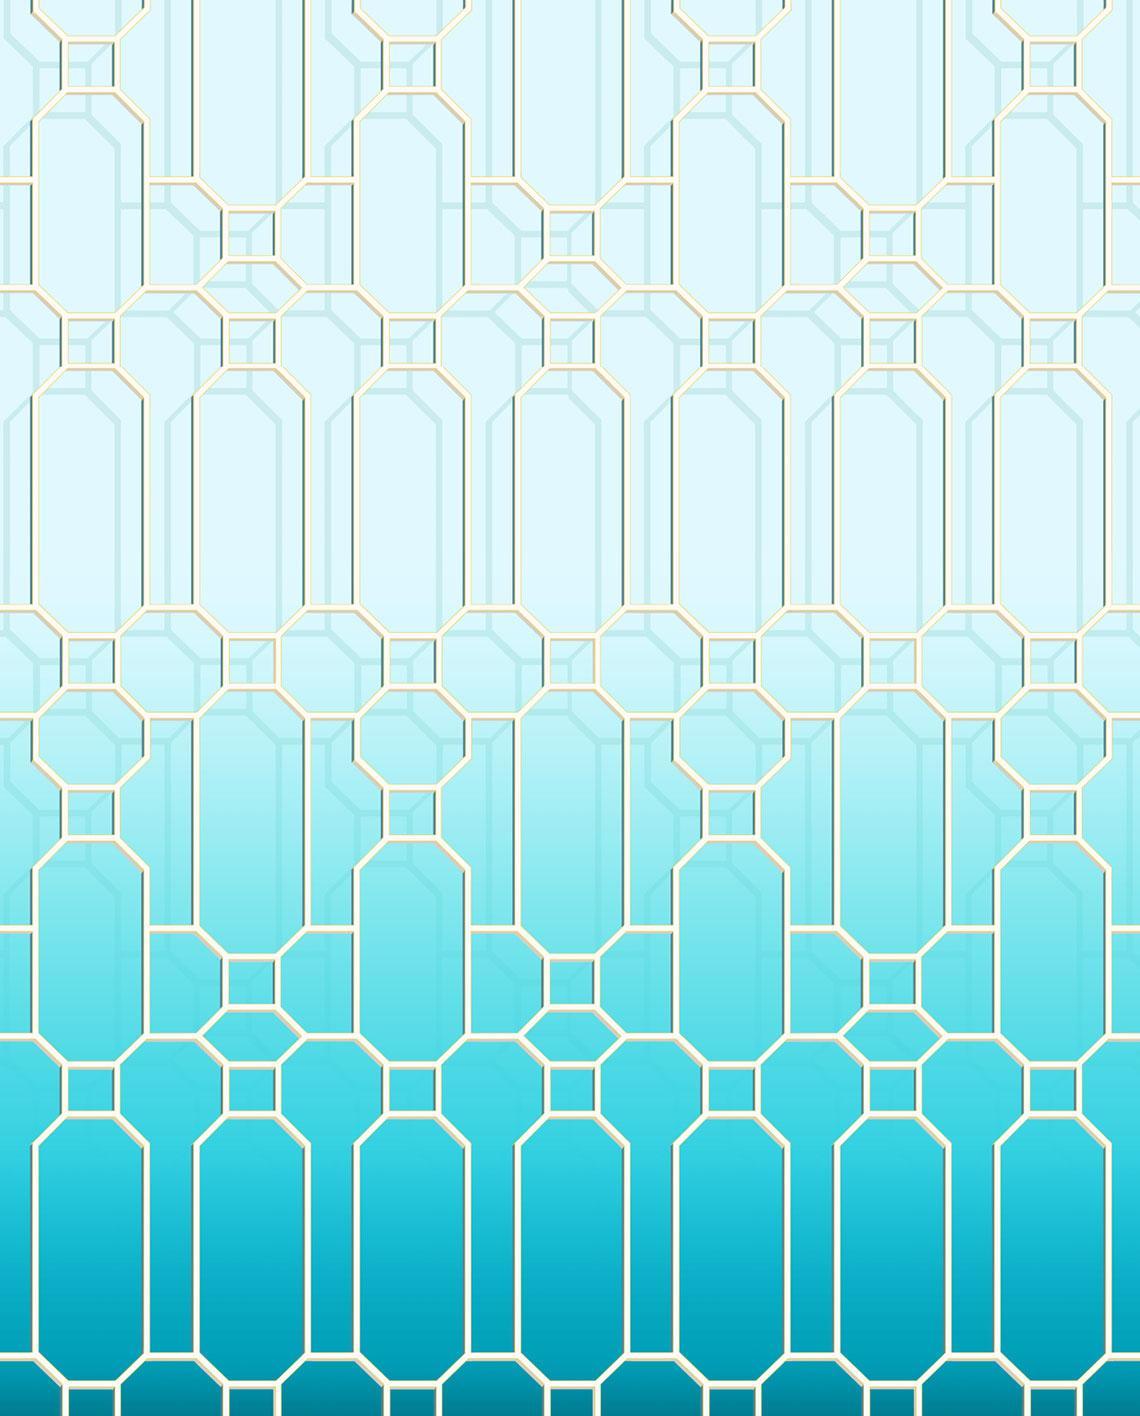 15._Fretwork_Wallpaper